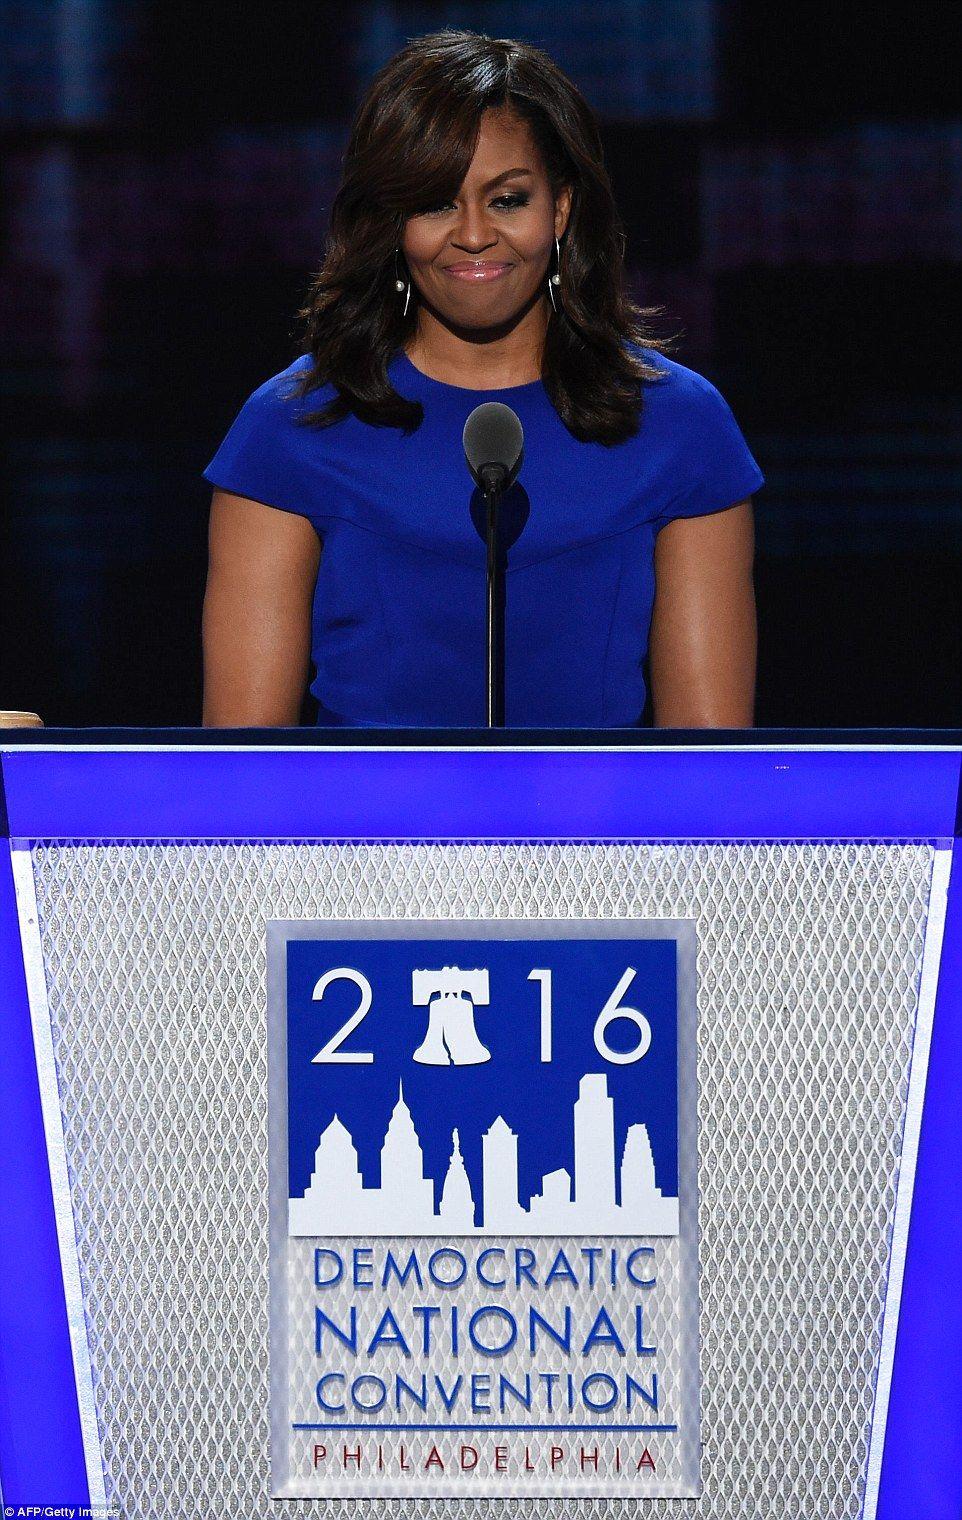 Michelle Obama Attacks Trump During Rousing Primetime Address At